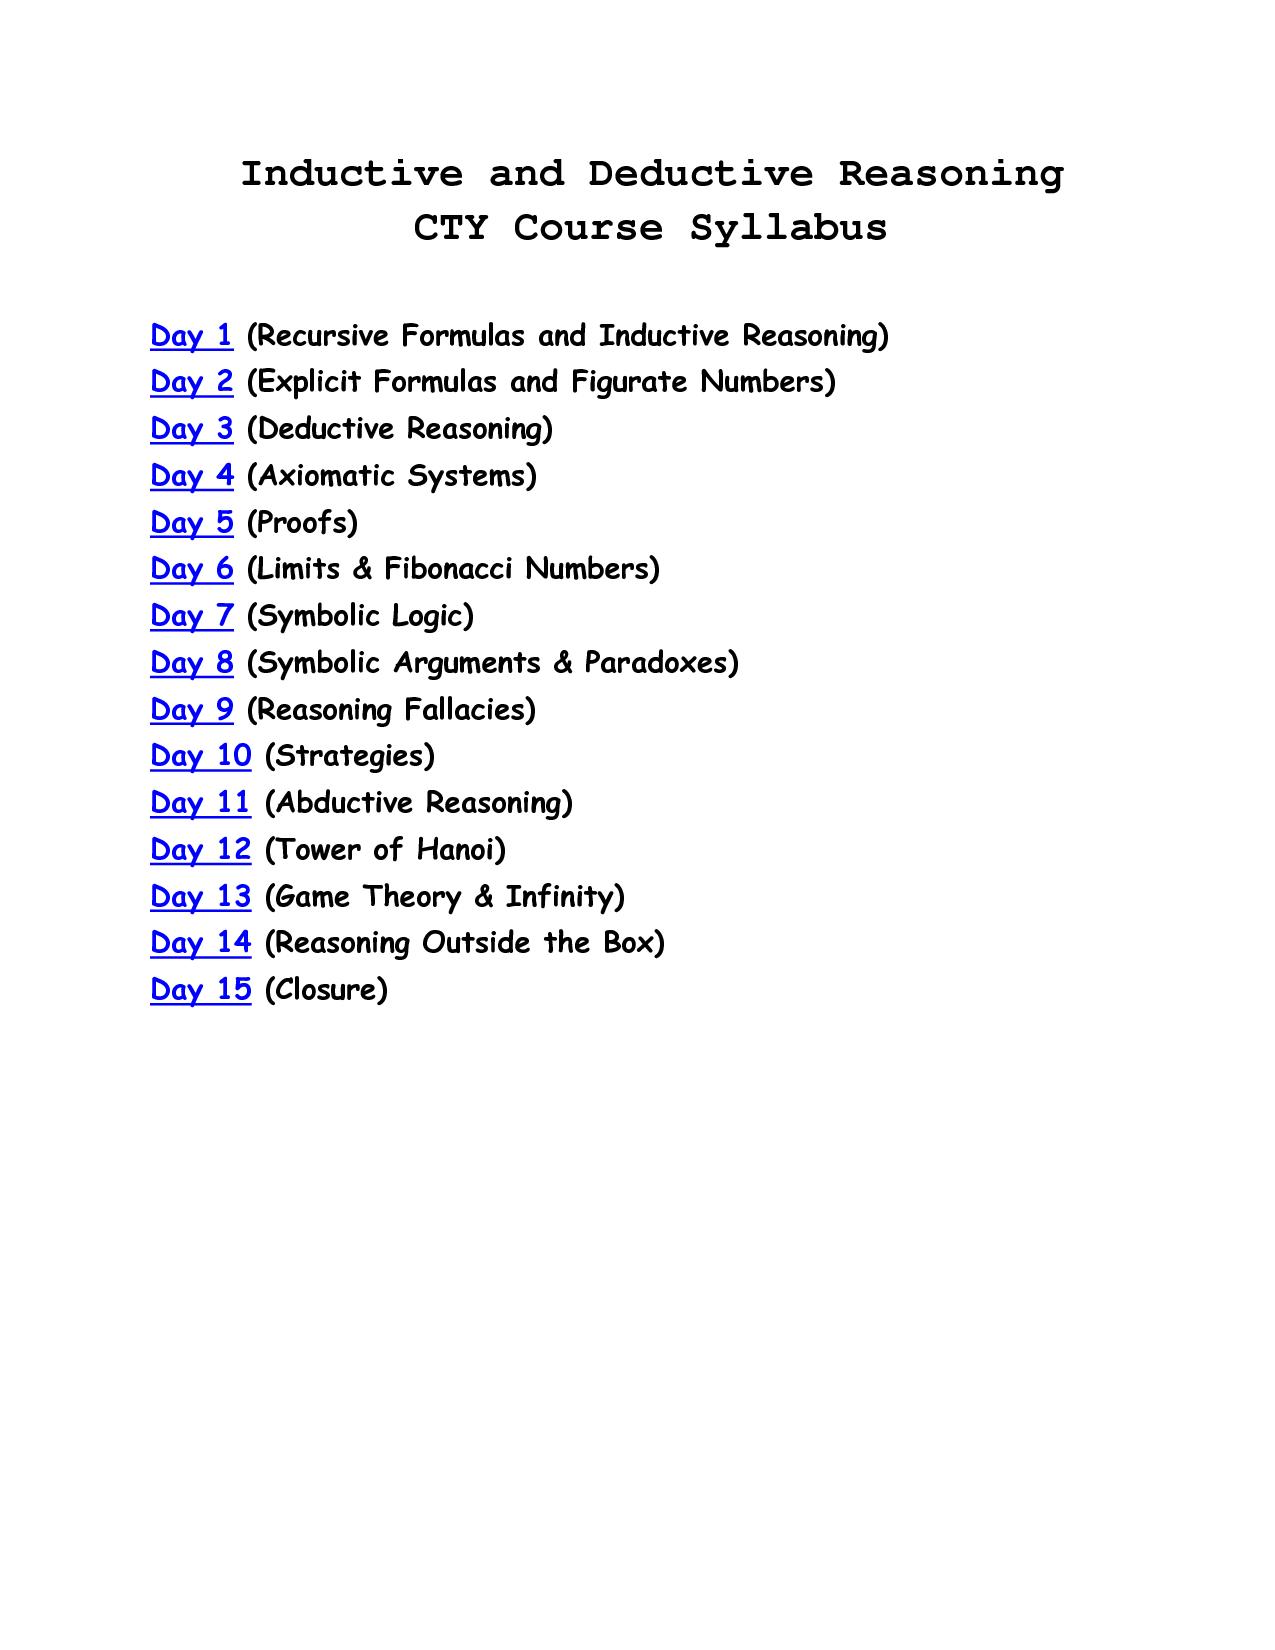 Porportional Reasoning Worksheet